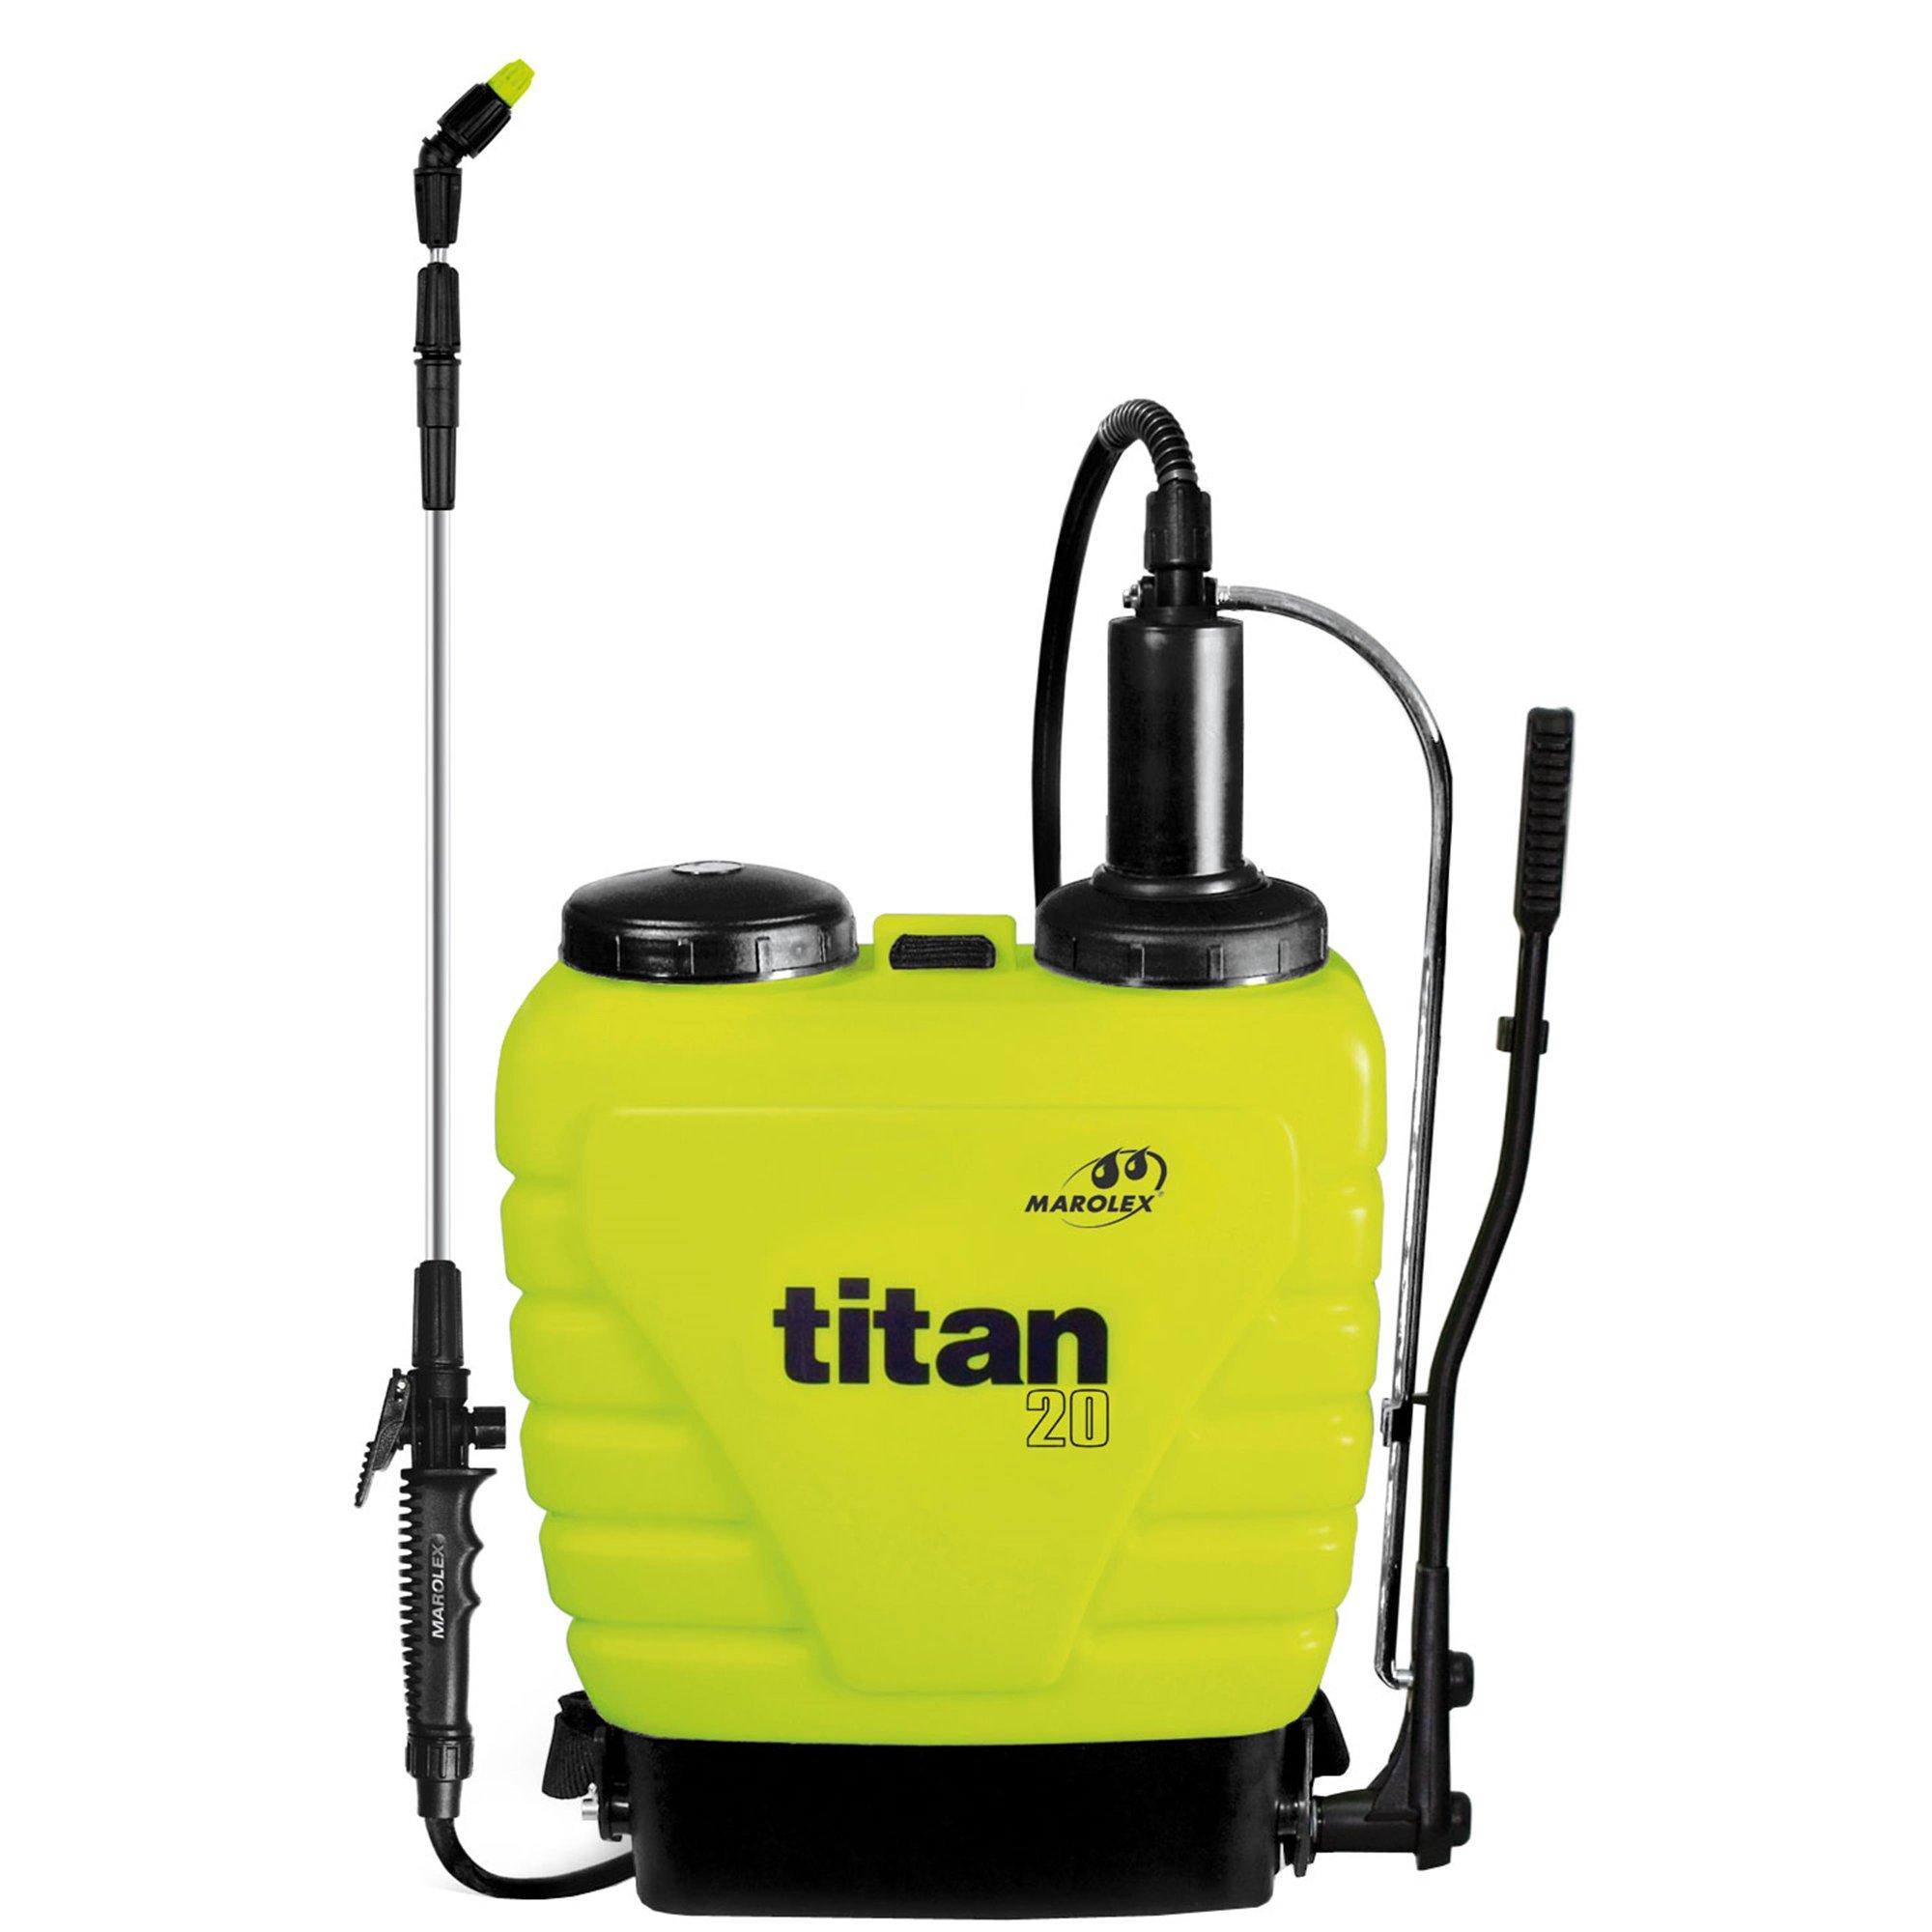 Marolex Sprayer Titan, Dichtung Viton Sprayer Titan 20 L. Viton |